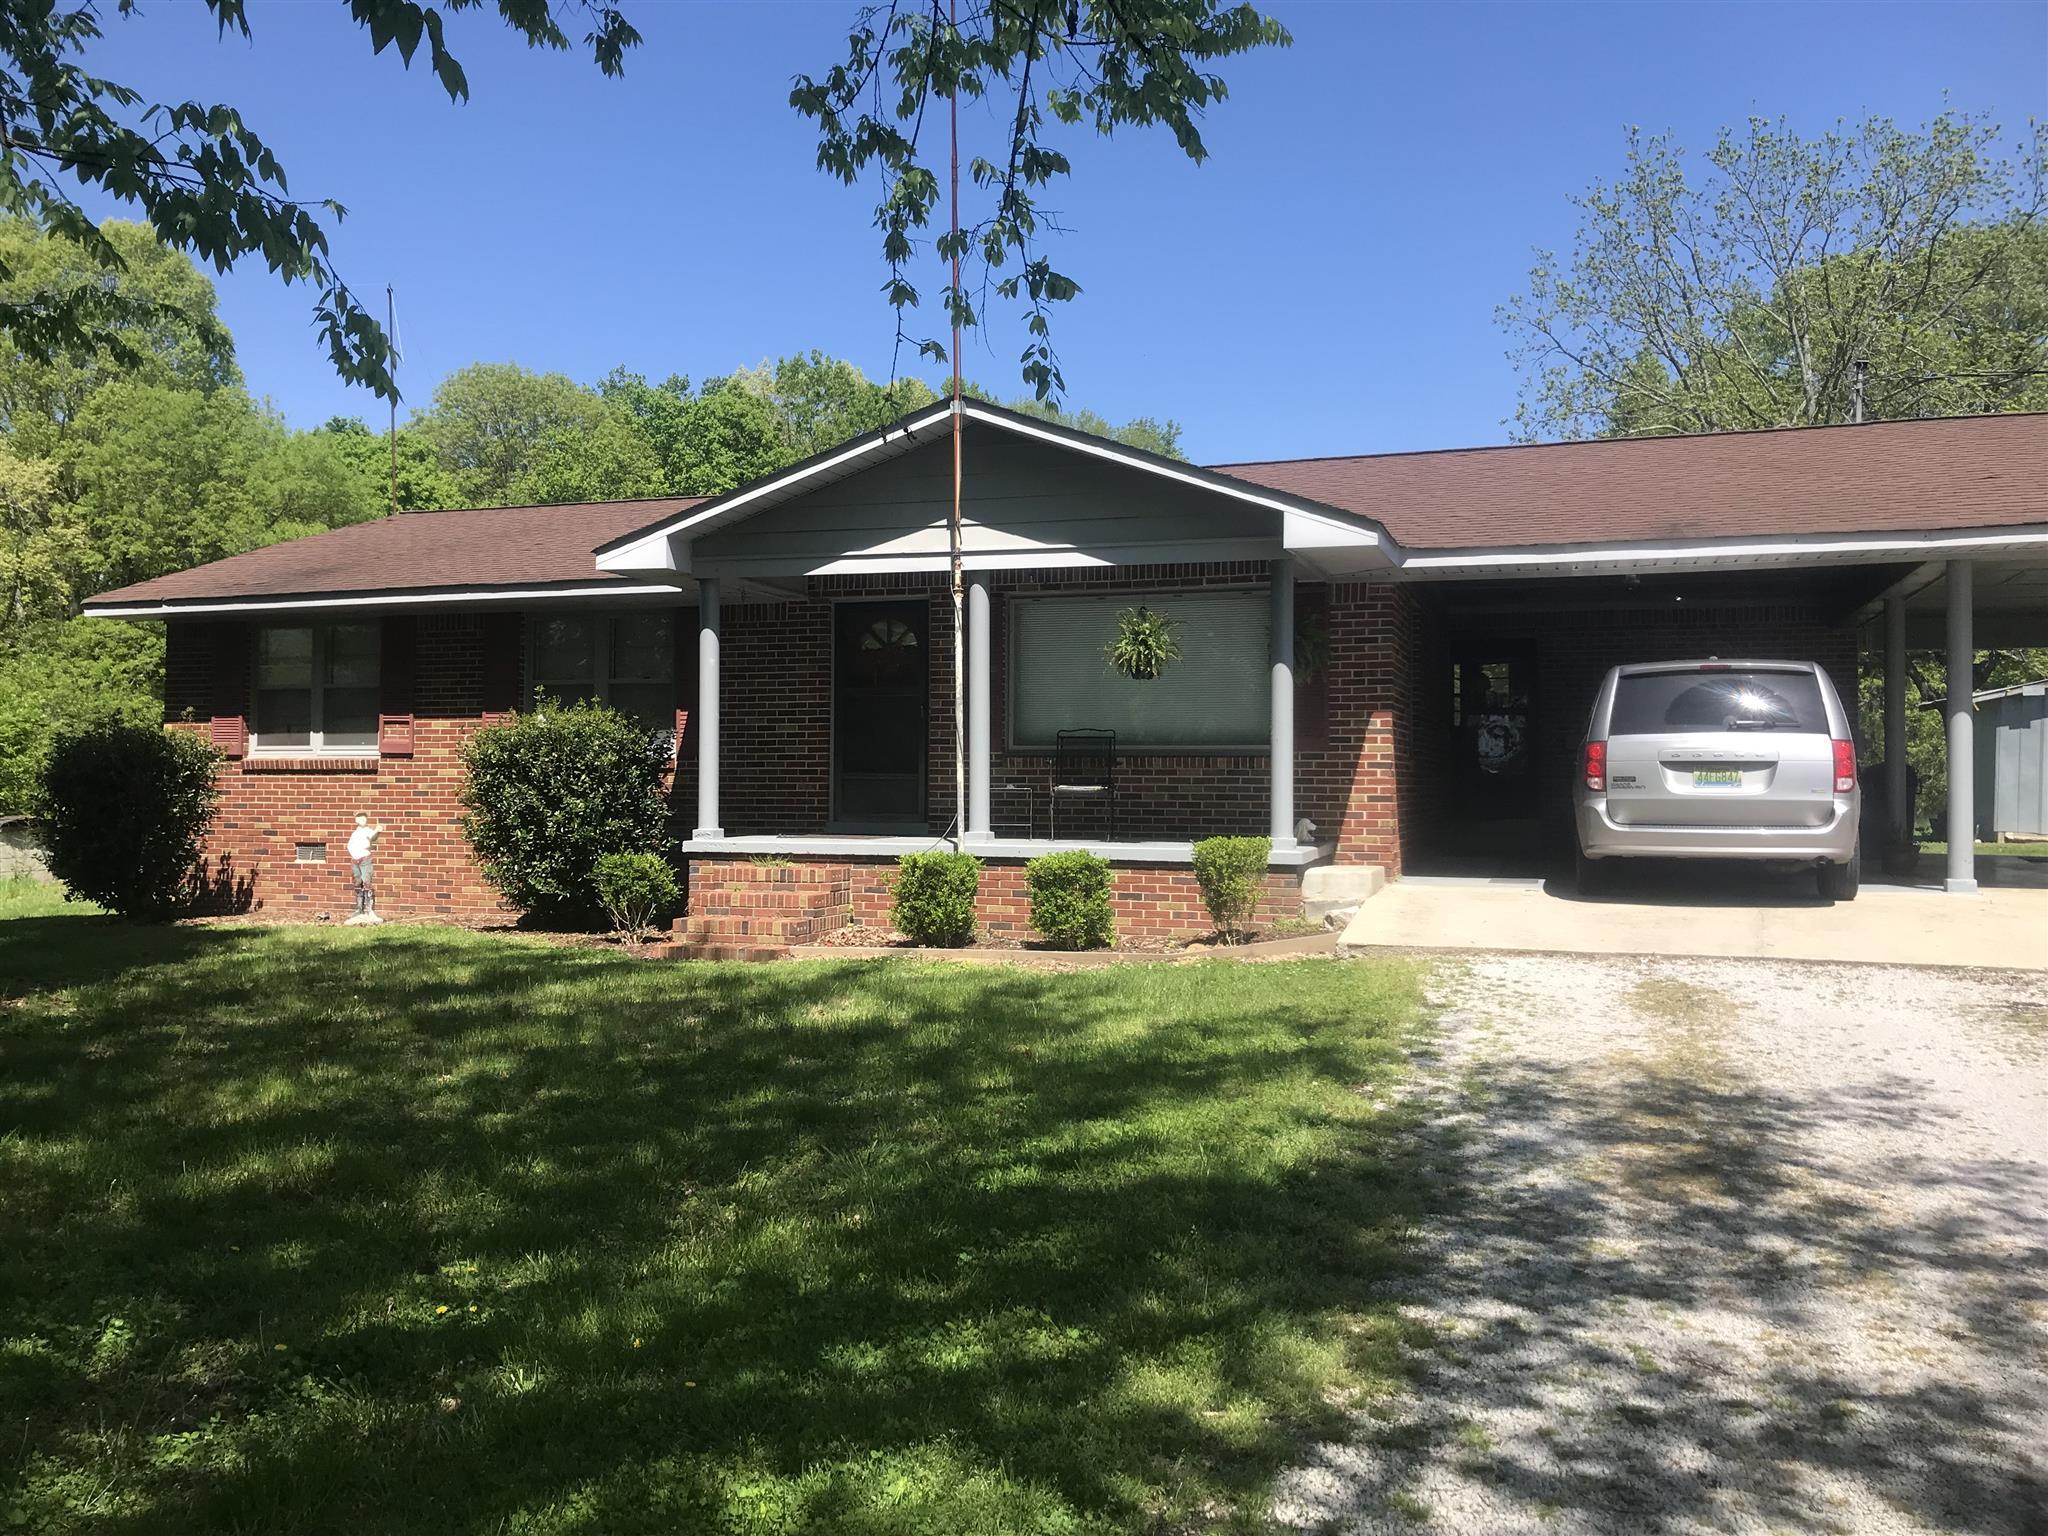 29569 Persimmon Tree Rd, Athens, AL 35611 - Athens, AL real estate listing